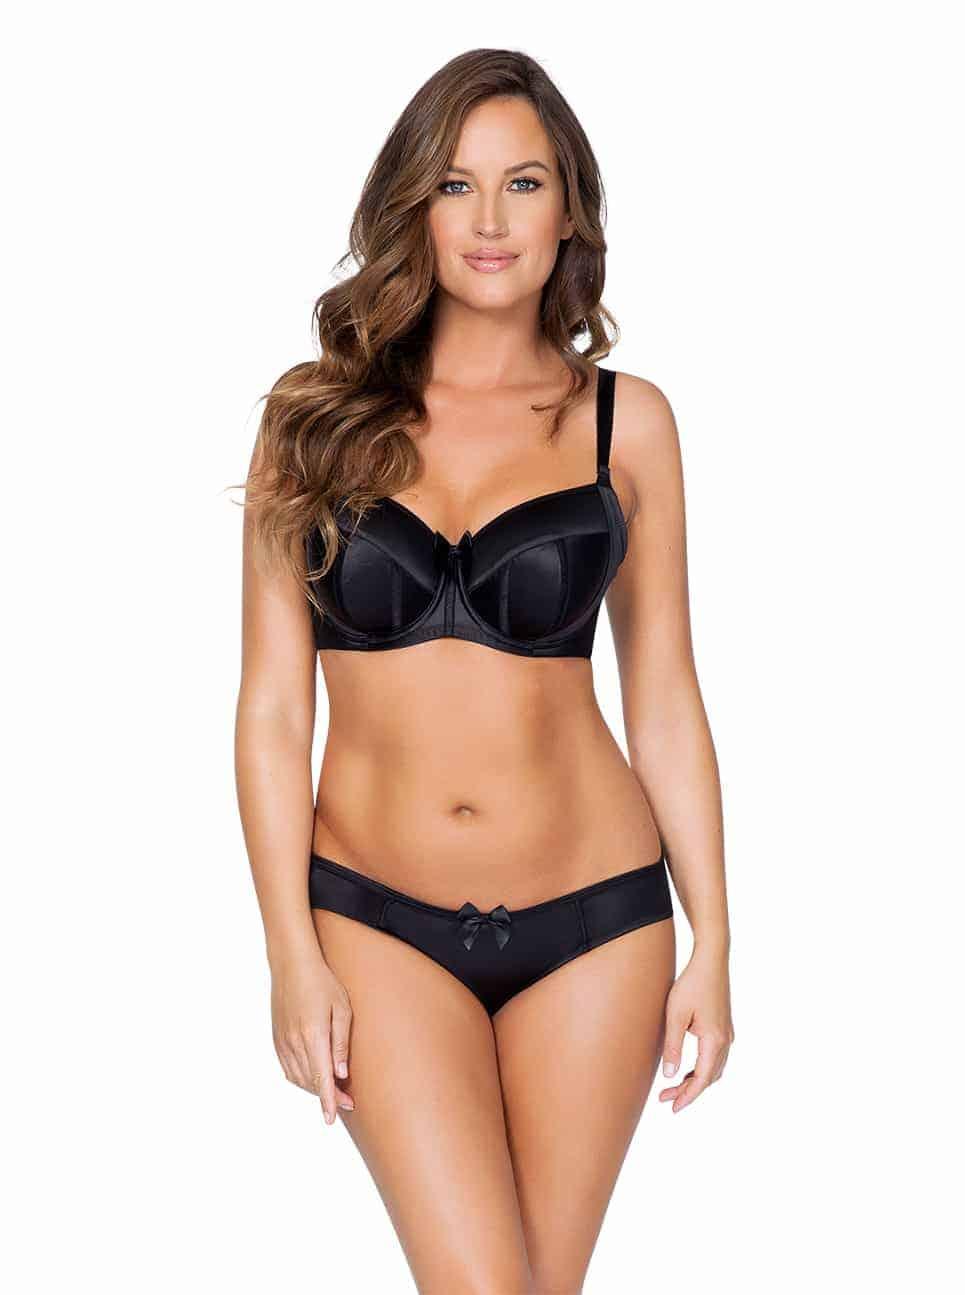 Charlotte PaddedBra6901 Bikini6905 Black Front 1 - Charlotte Bikini - Black - 6905